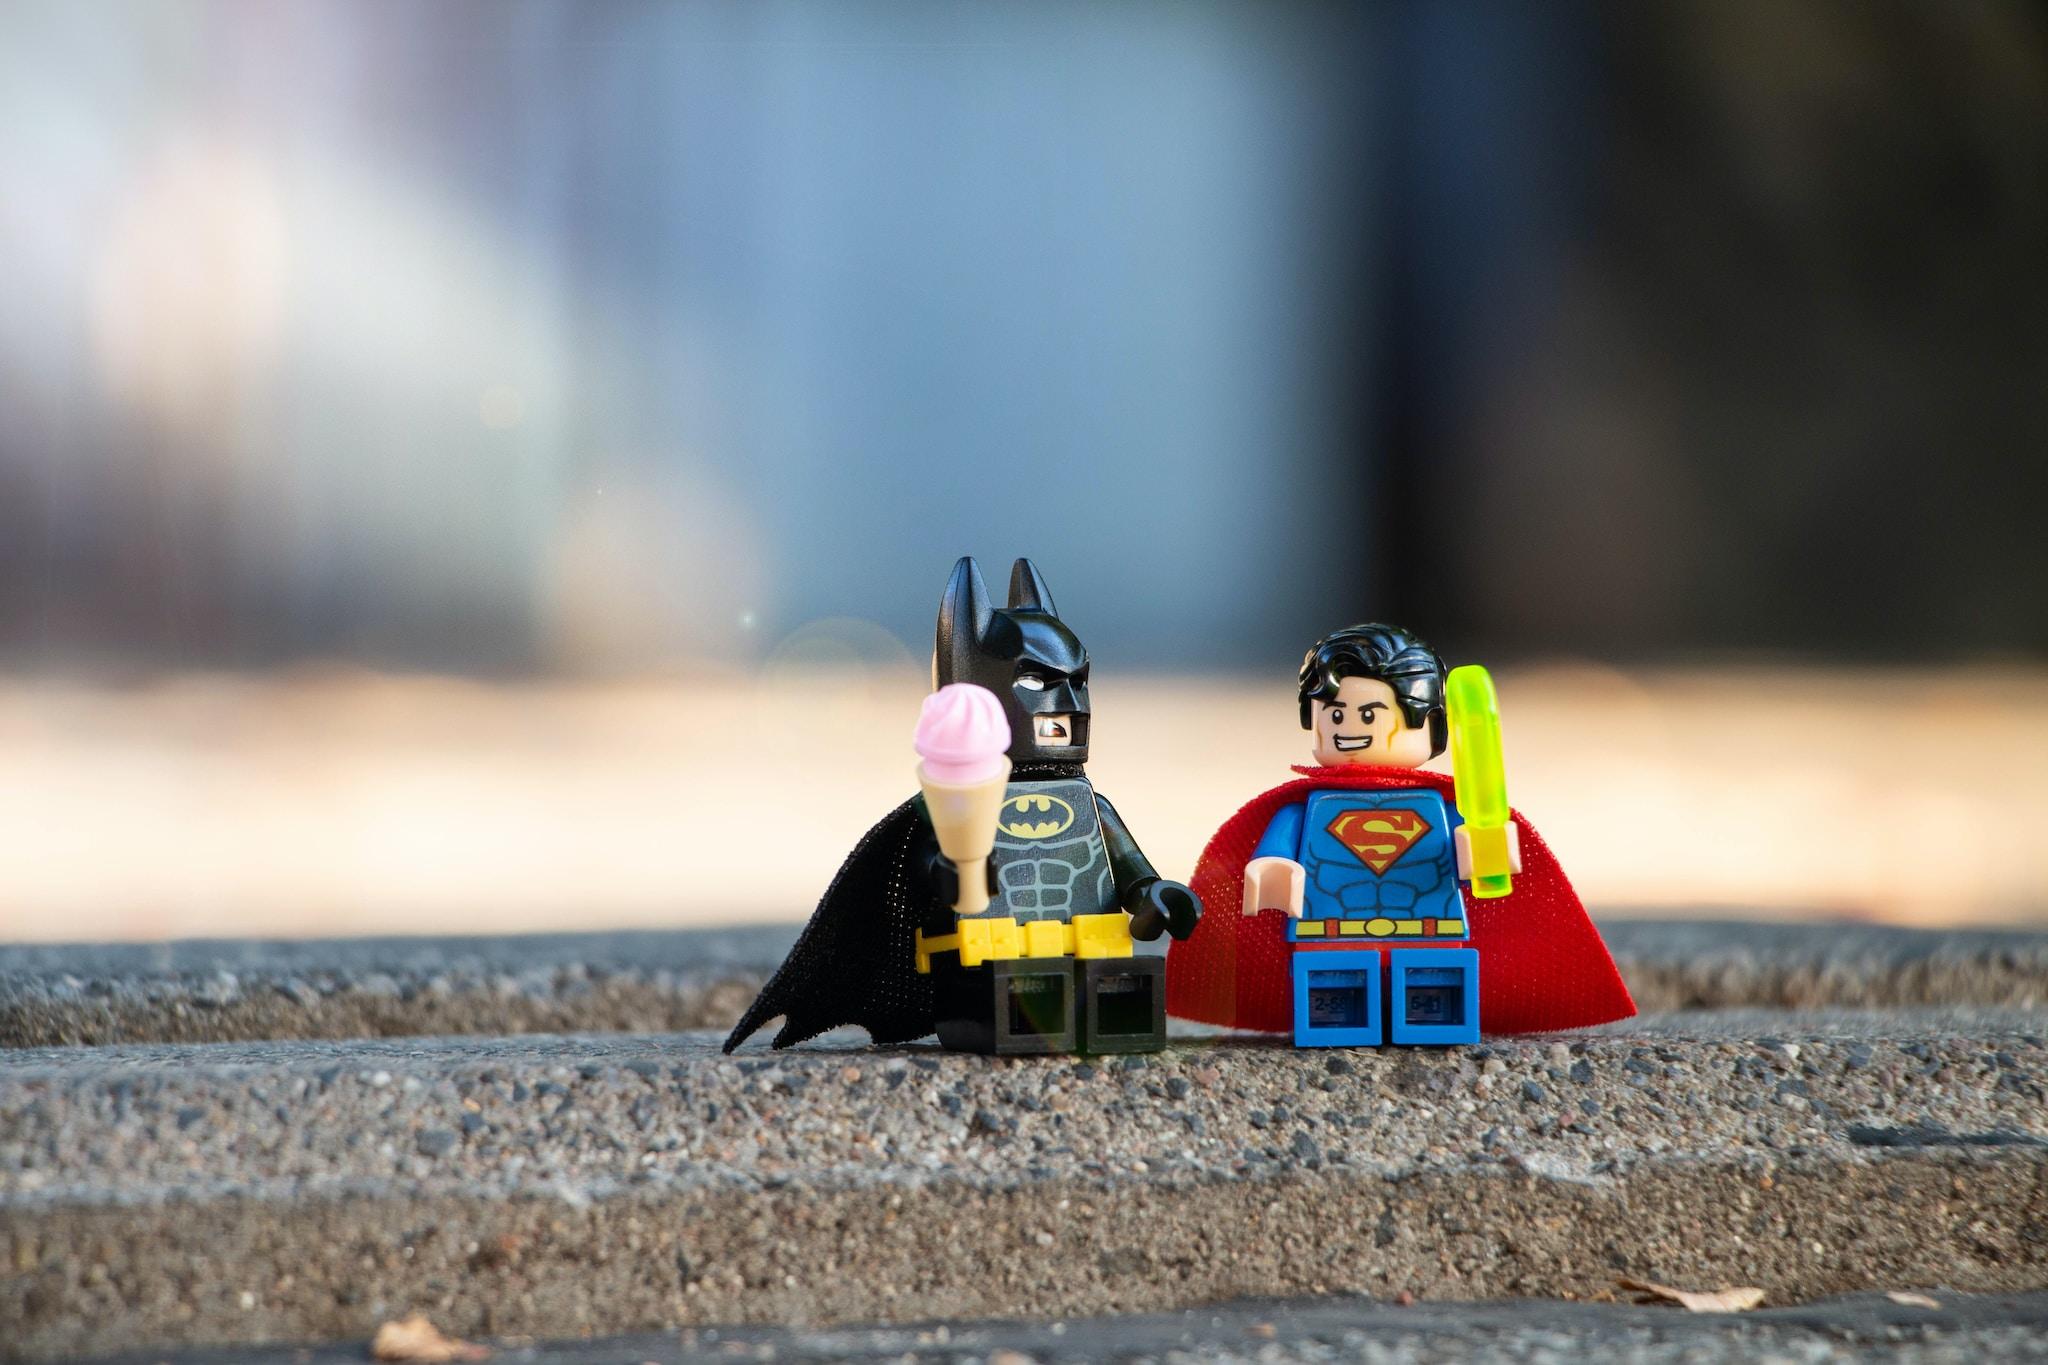 How to be a superhero editor